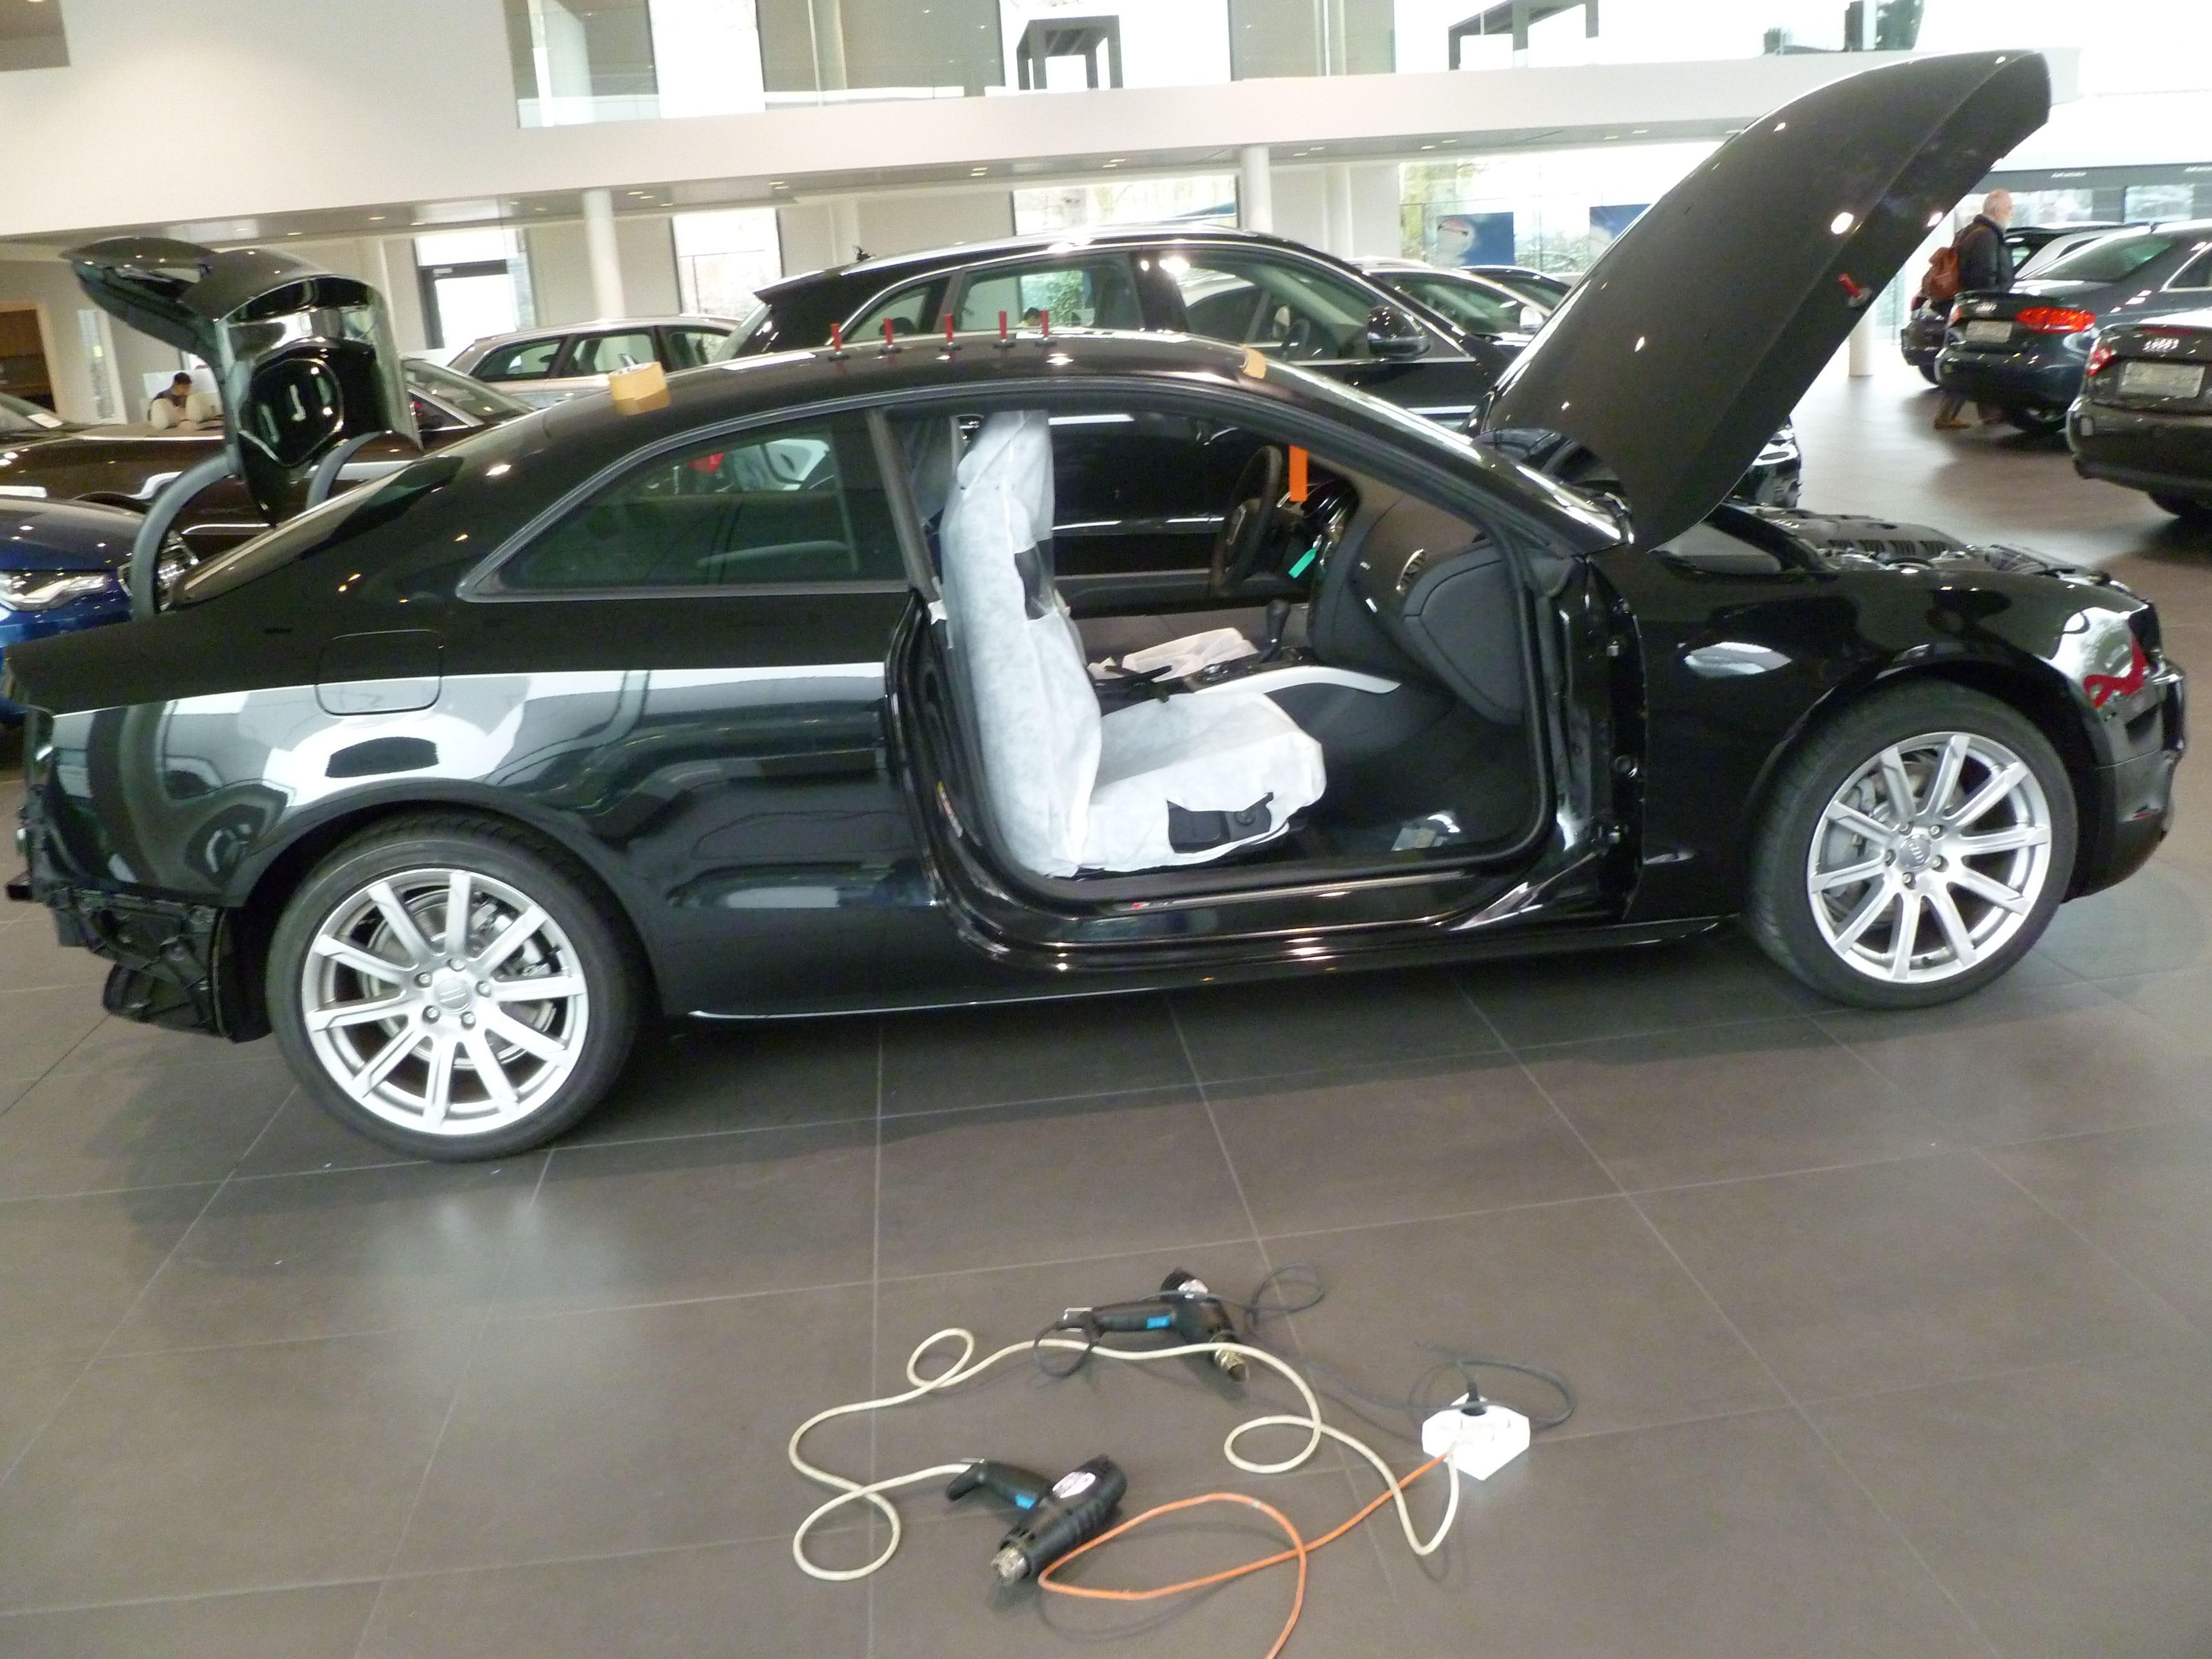 Audi A5 Coupe met Mat Zwarte Wrap, Carwrapping door Wrapmyride.nu Foto-nr:4616, ©2021